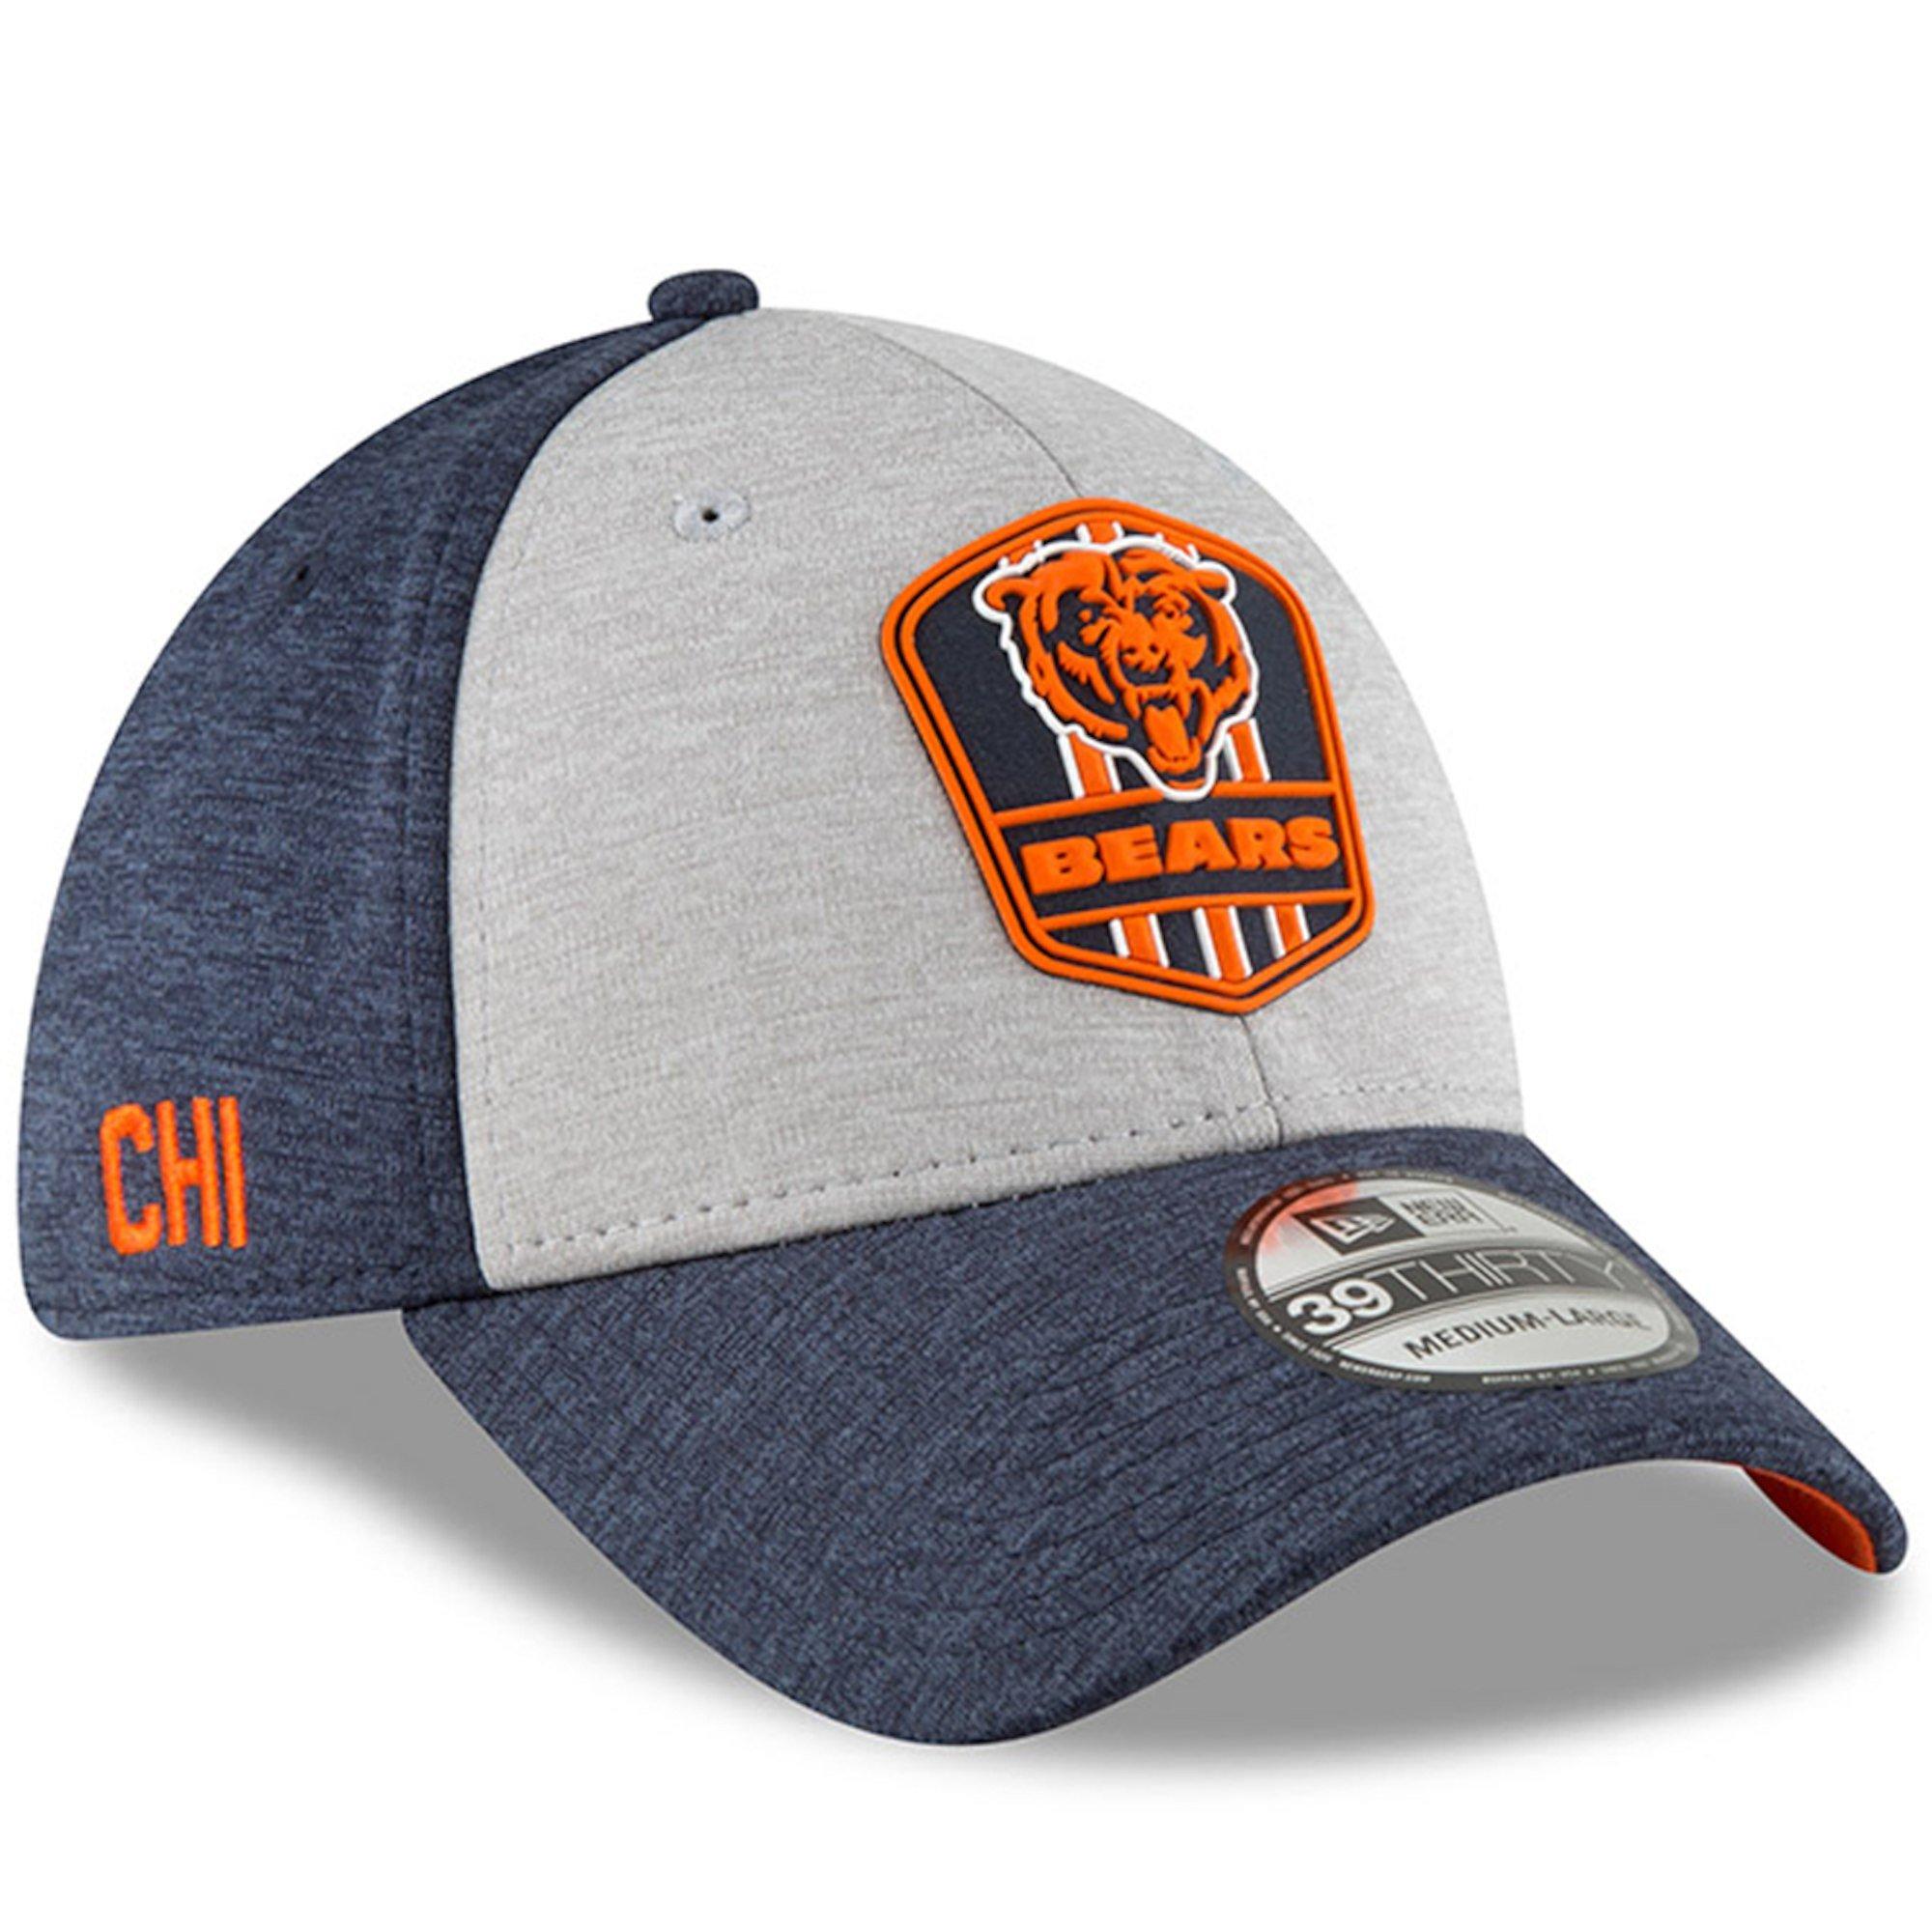 Men s Chicago Bears New Era Heather Gray Navy NFL18 Sideline Road Official  39THIRTY Flex Hat 86c84b64c432